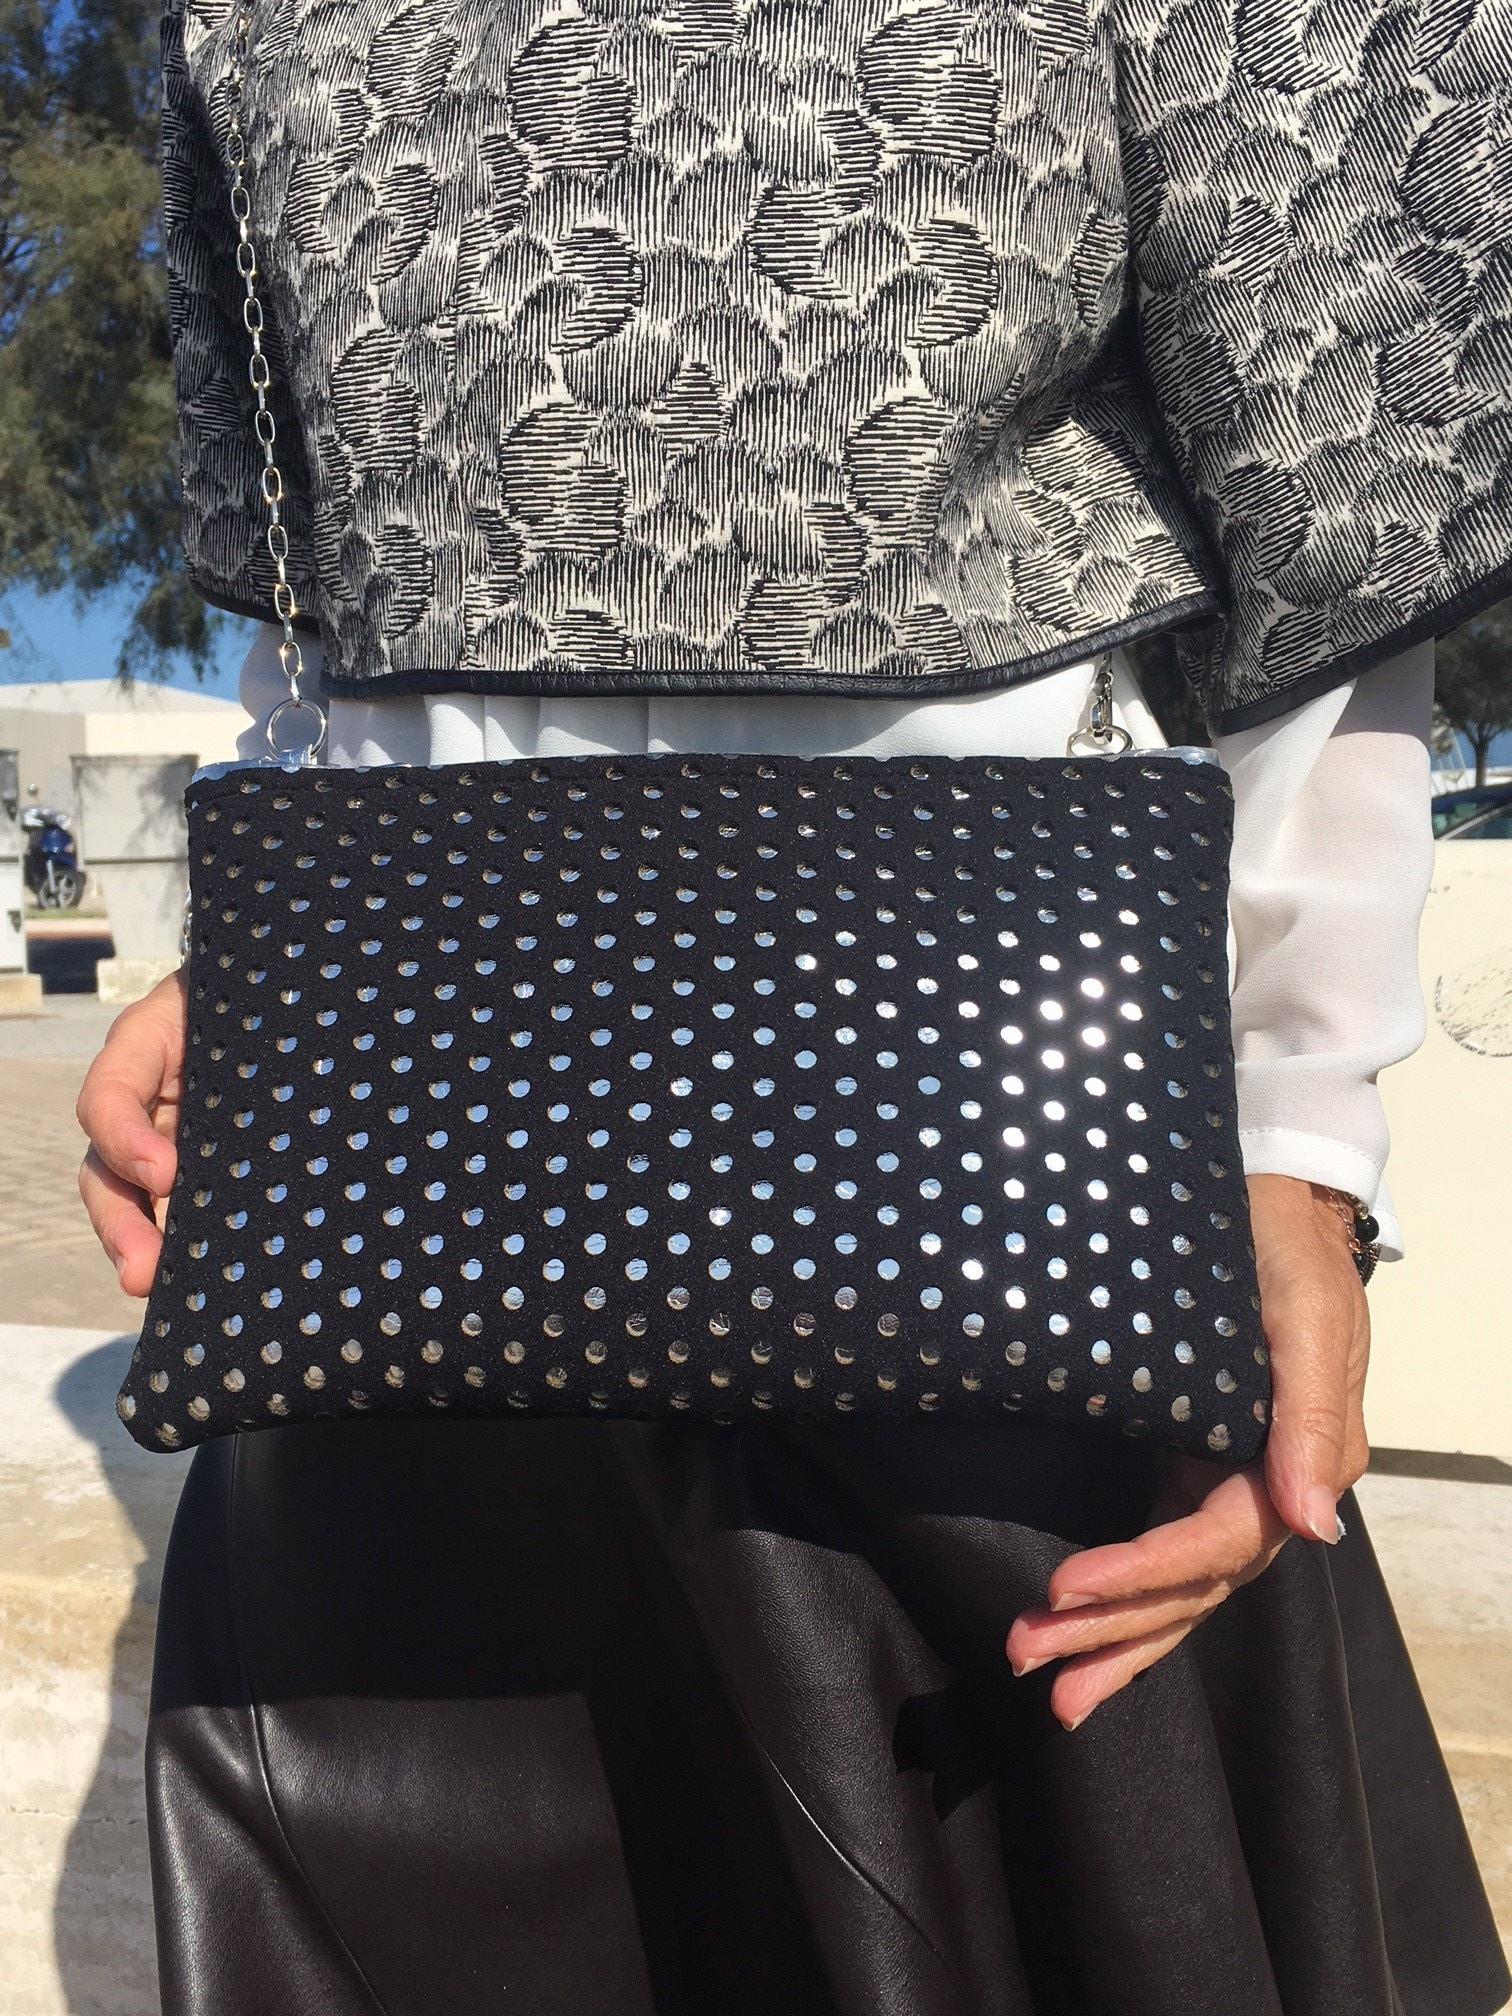 c86559d3cc Black Neoprene bag-perforated neoprene bag silver-gold-hand bag ...